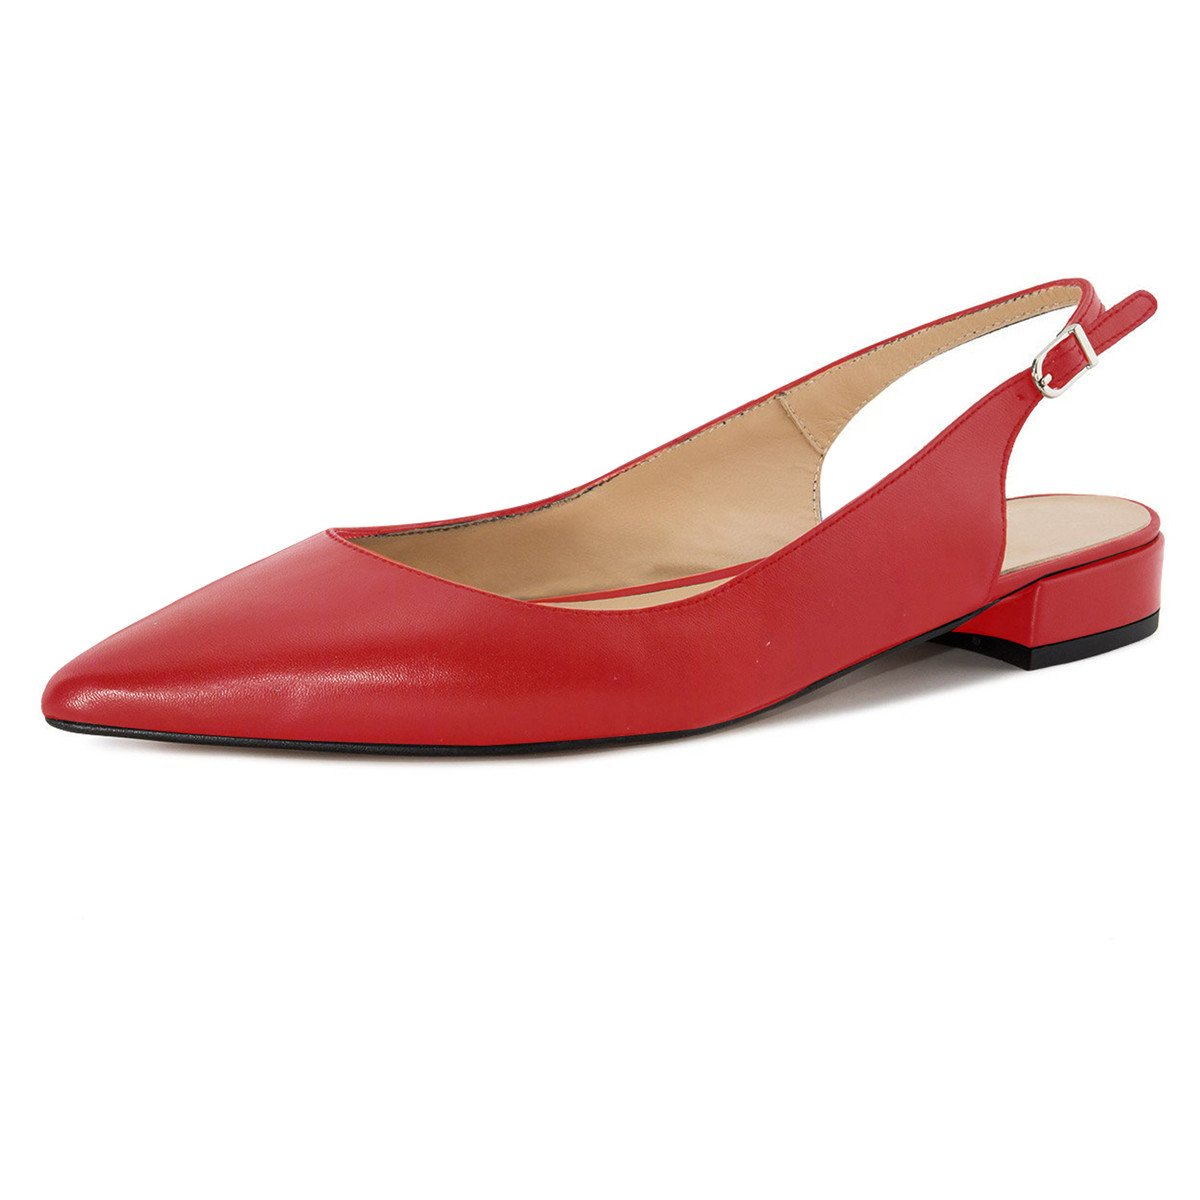 Soireelady Women's Slingback Low Heel Pumps Shoes Pointed Toe Ankle Strap 2cm Block Heel Summer Pumps Red US7.5